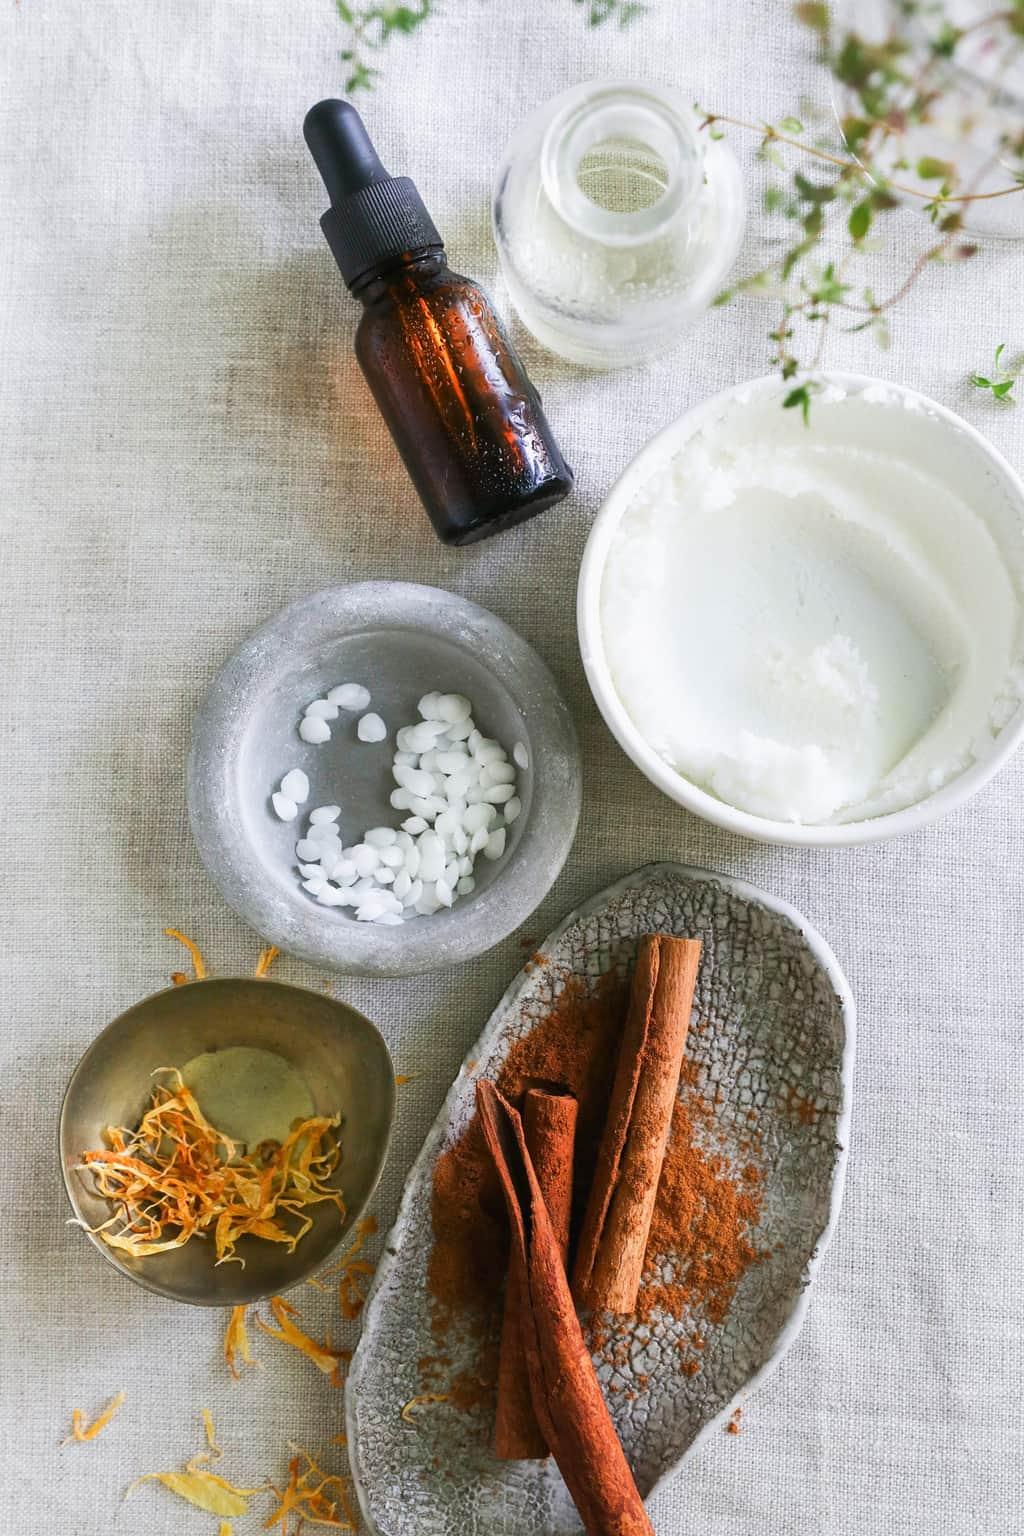 Ingredients for Warming DIY Muscle Rub